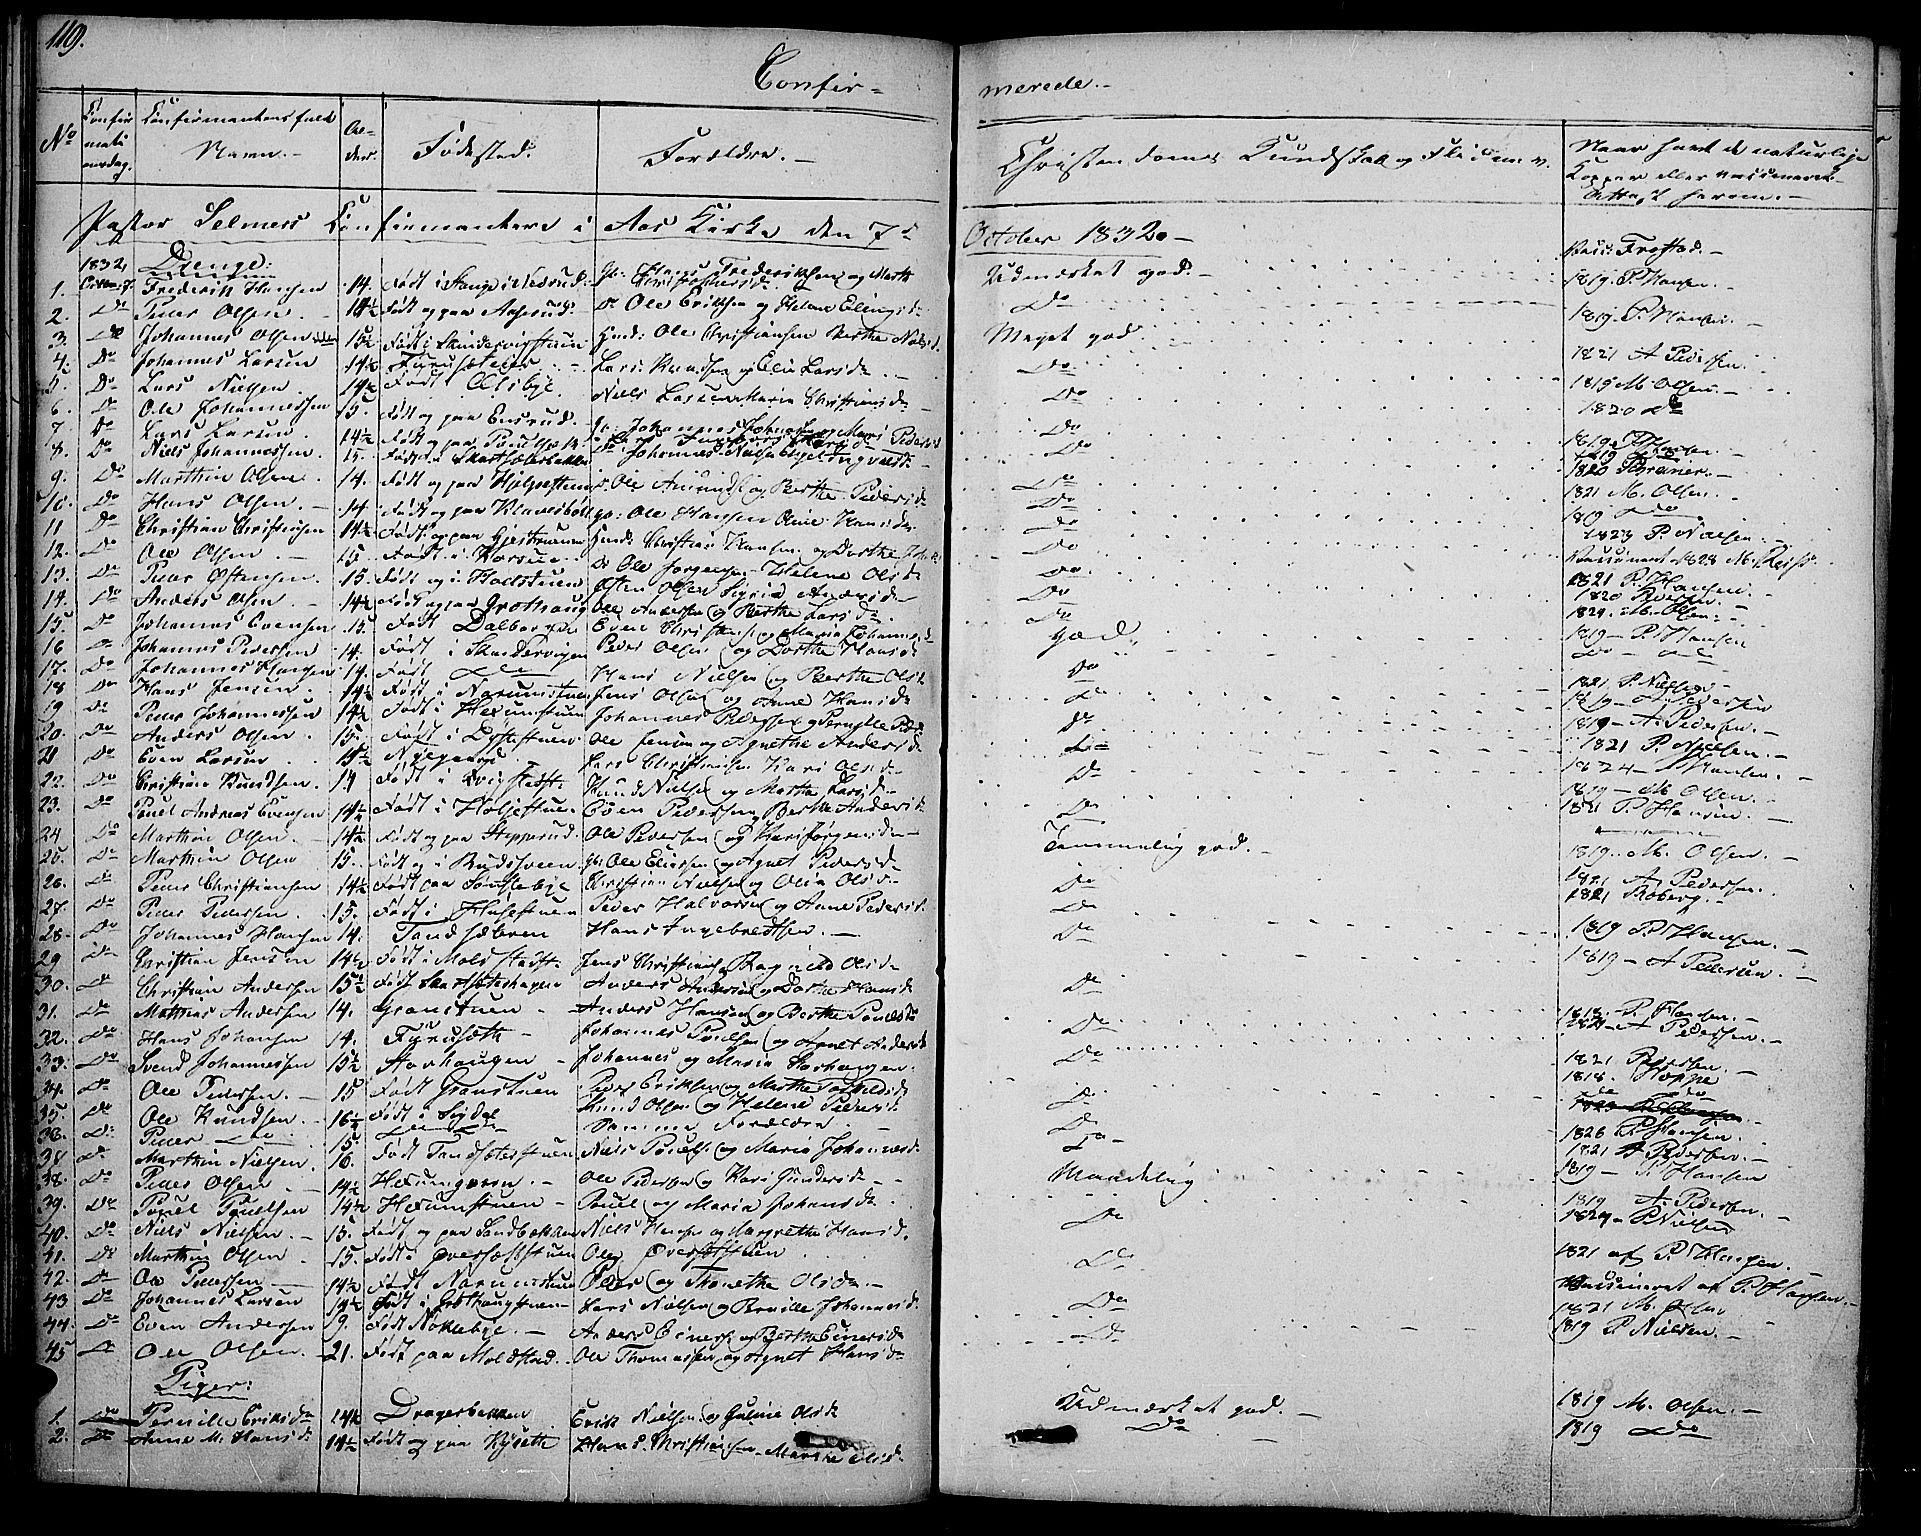 SAH, Vestre Toten prestekontor, H/Ha/Haa/L0002: Ministerialbok nr. 2, 1825-1837, s. 119